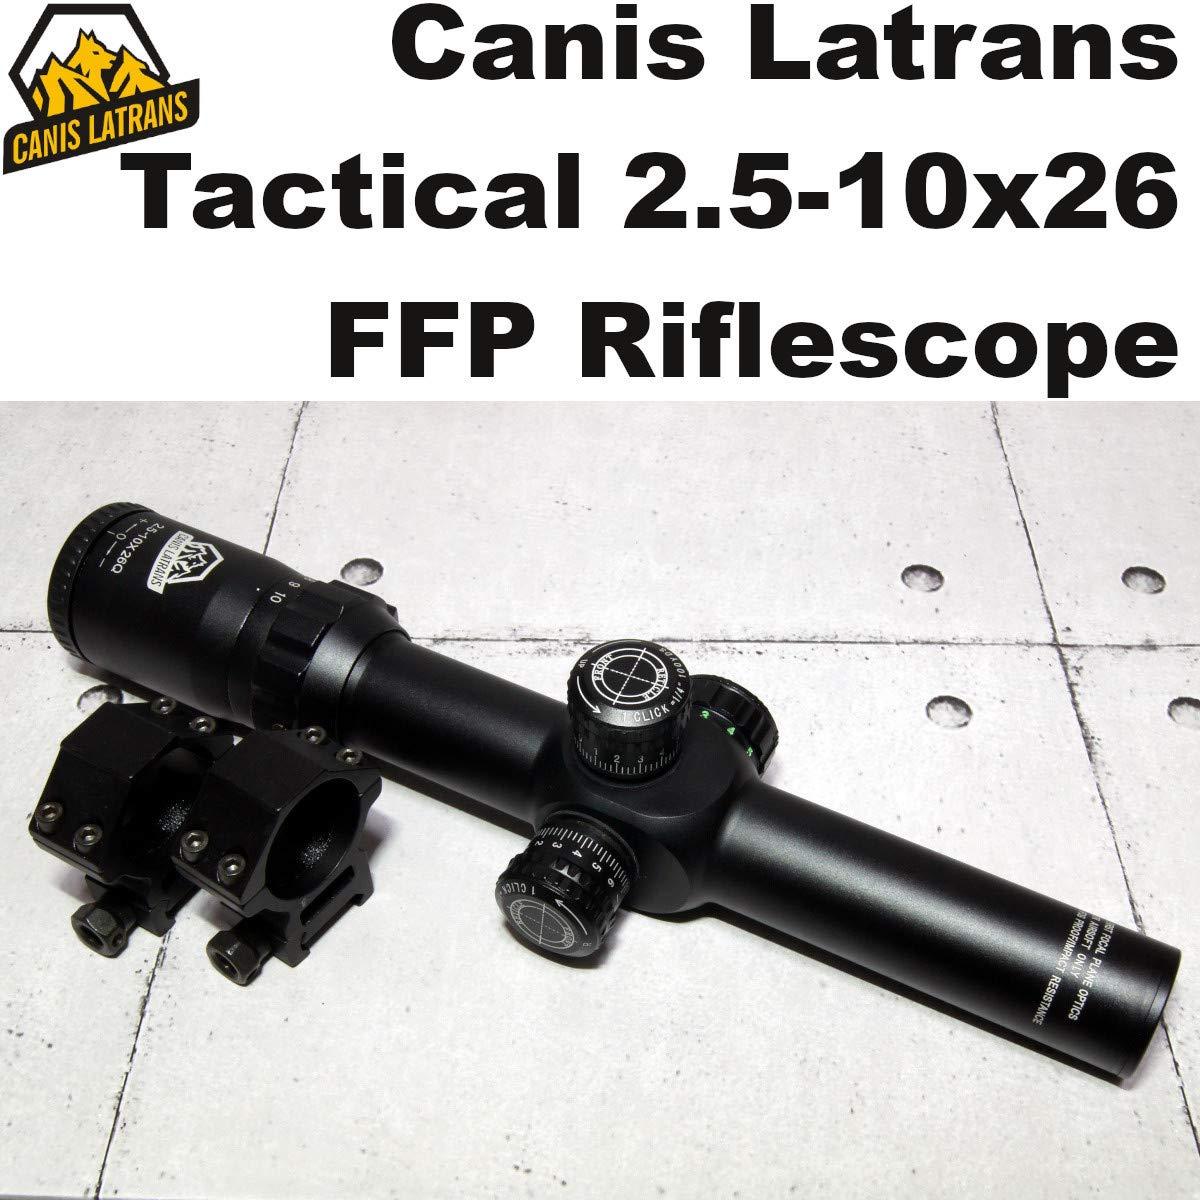 Canis Latrans Tactical 2.5-10x26 FFP ライフルスコープ (1013) ファースト フォーカル プレン エアガン 電動ガン ガスガン スナイパー B07S617JRW